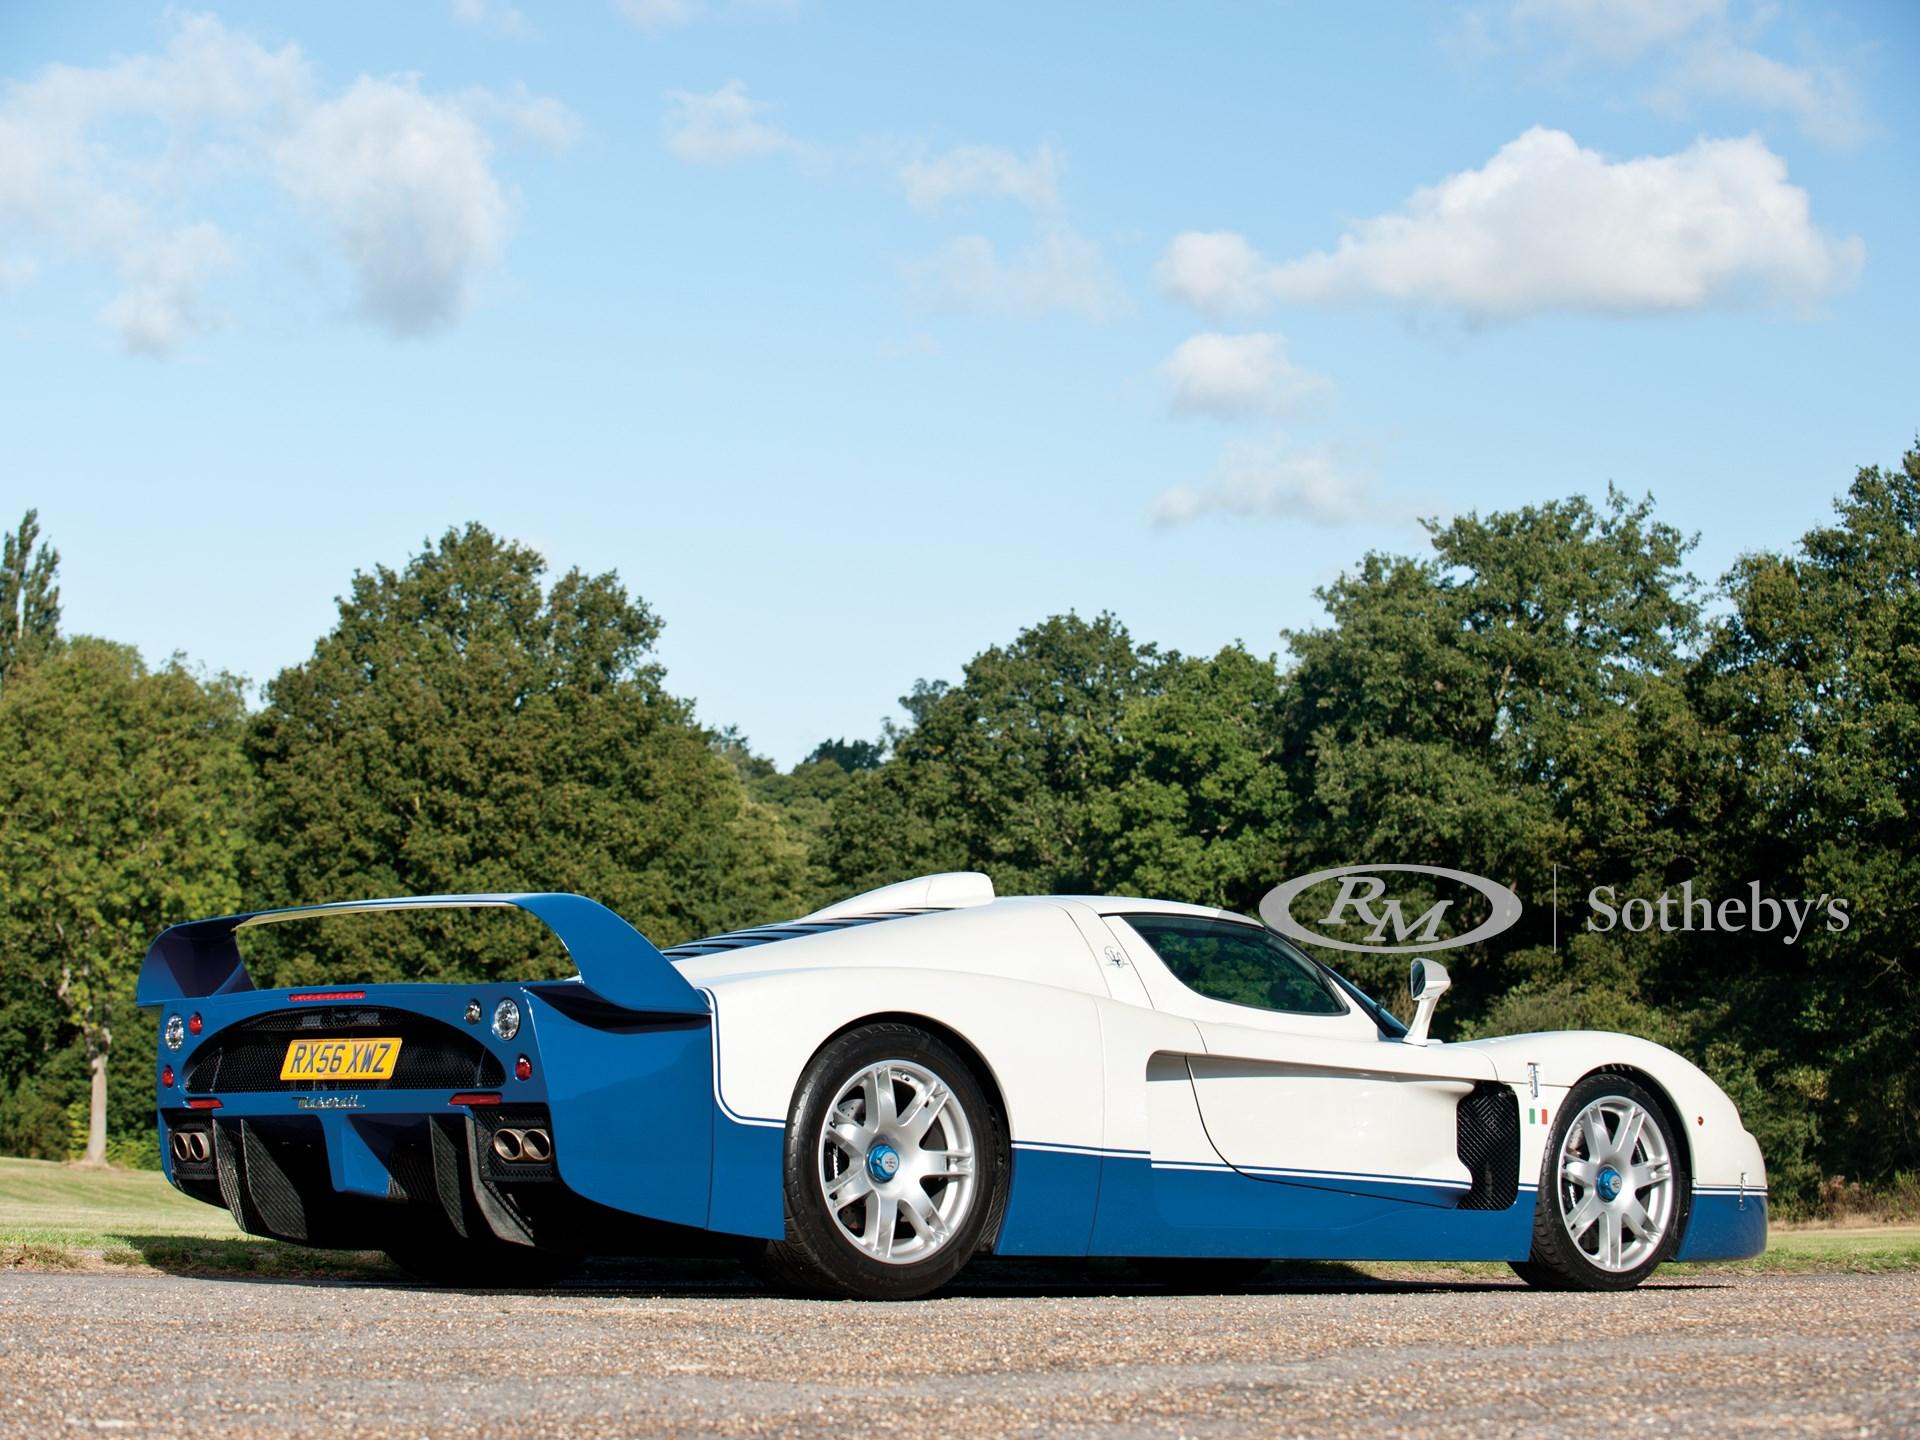 2005 Maserati MC12 | London 2012 | RM Sotheby's